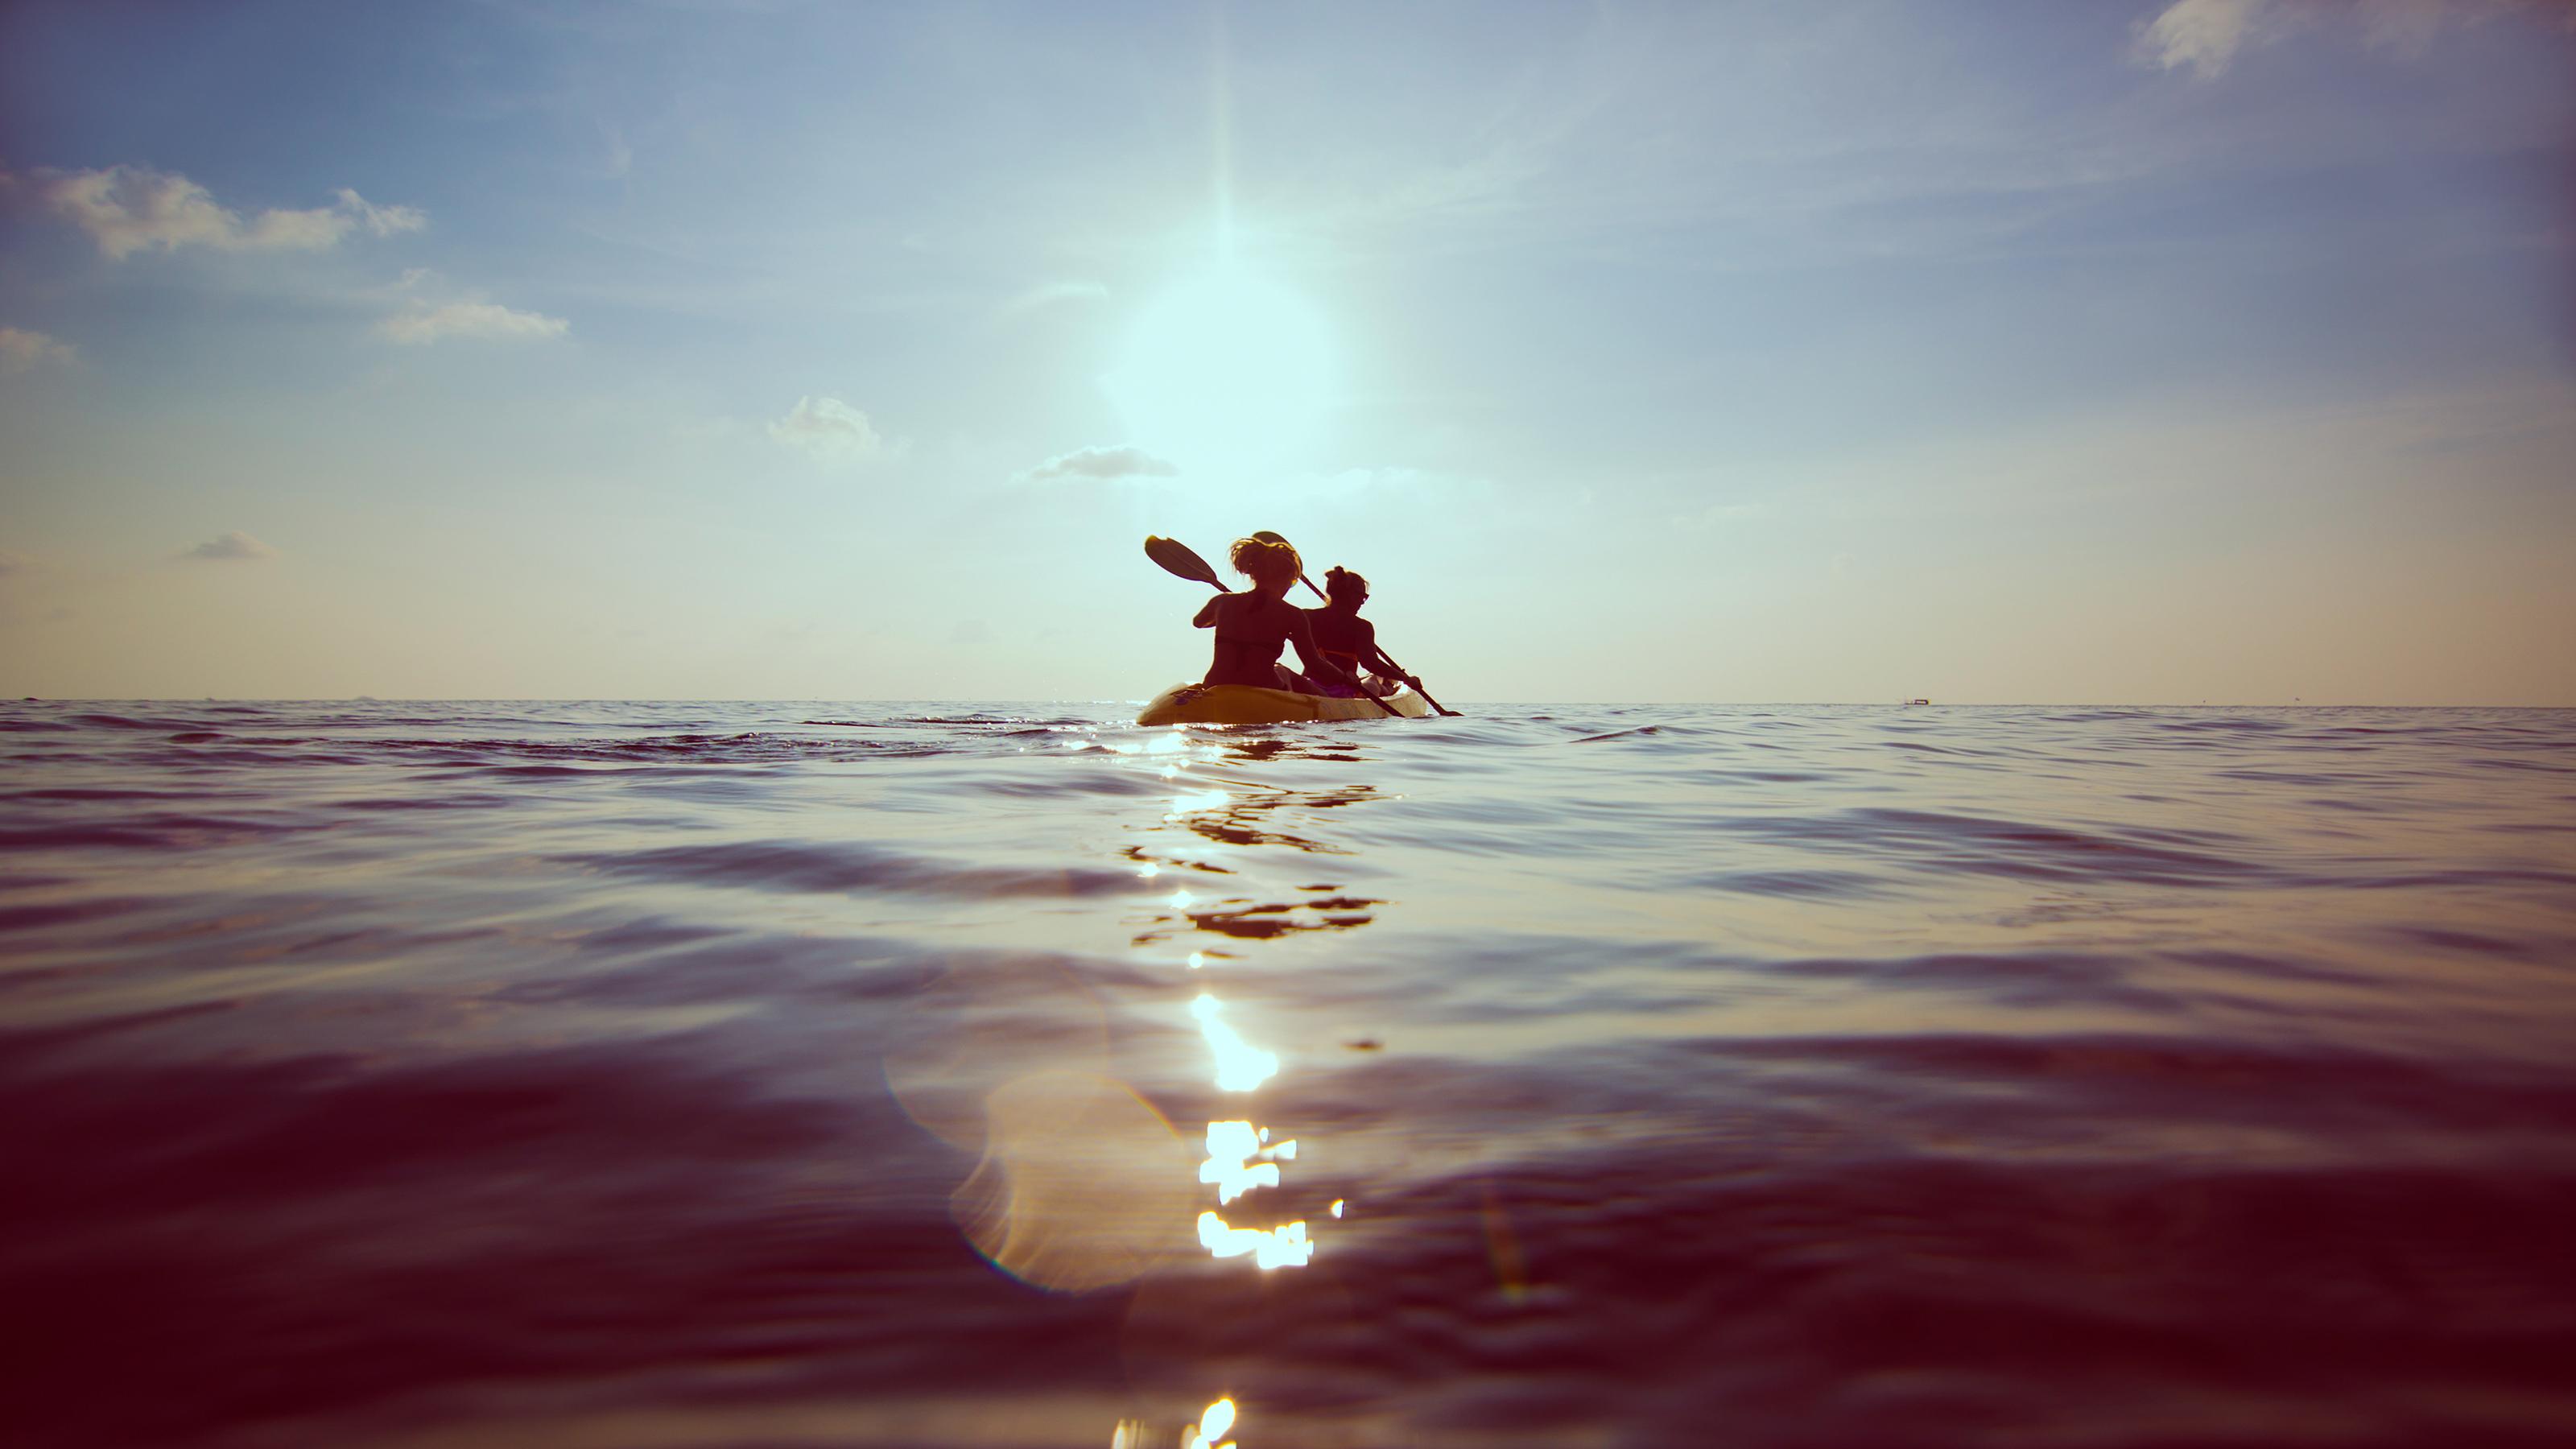 Boating rear